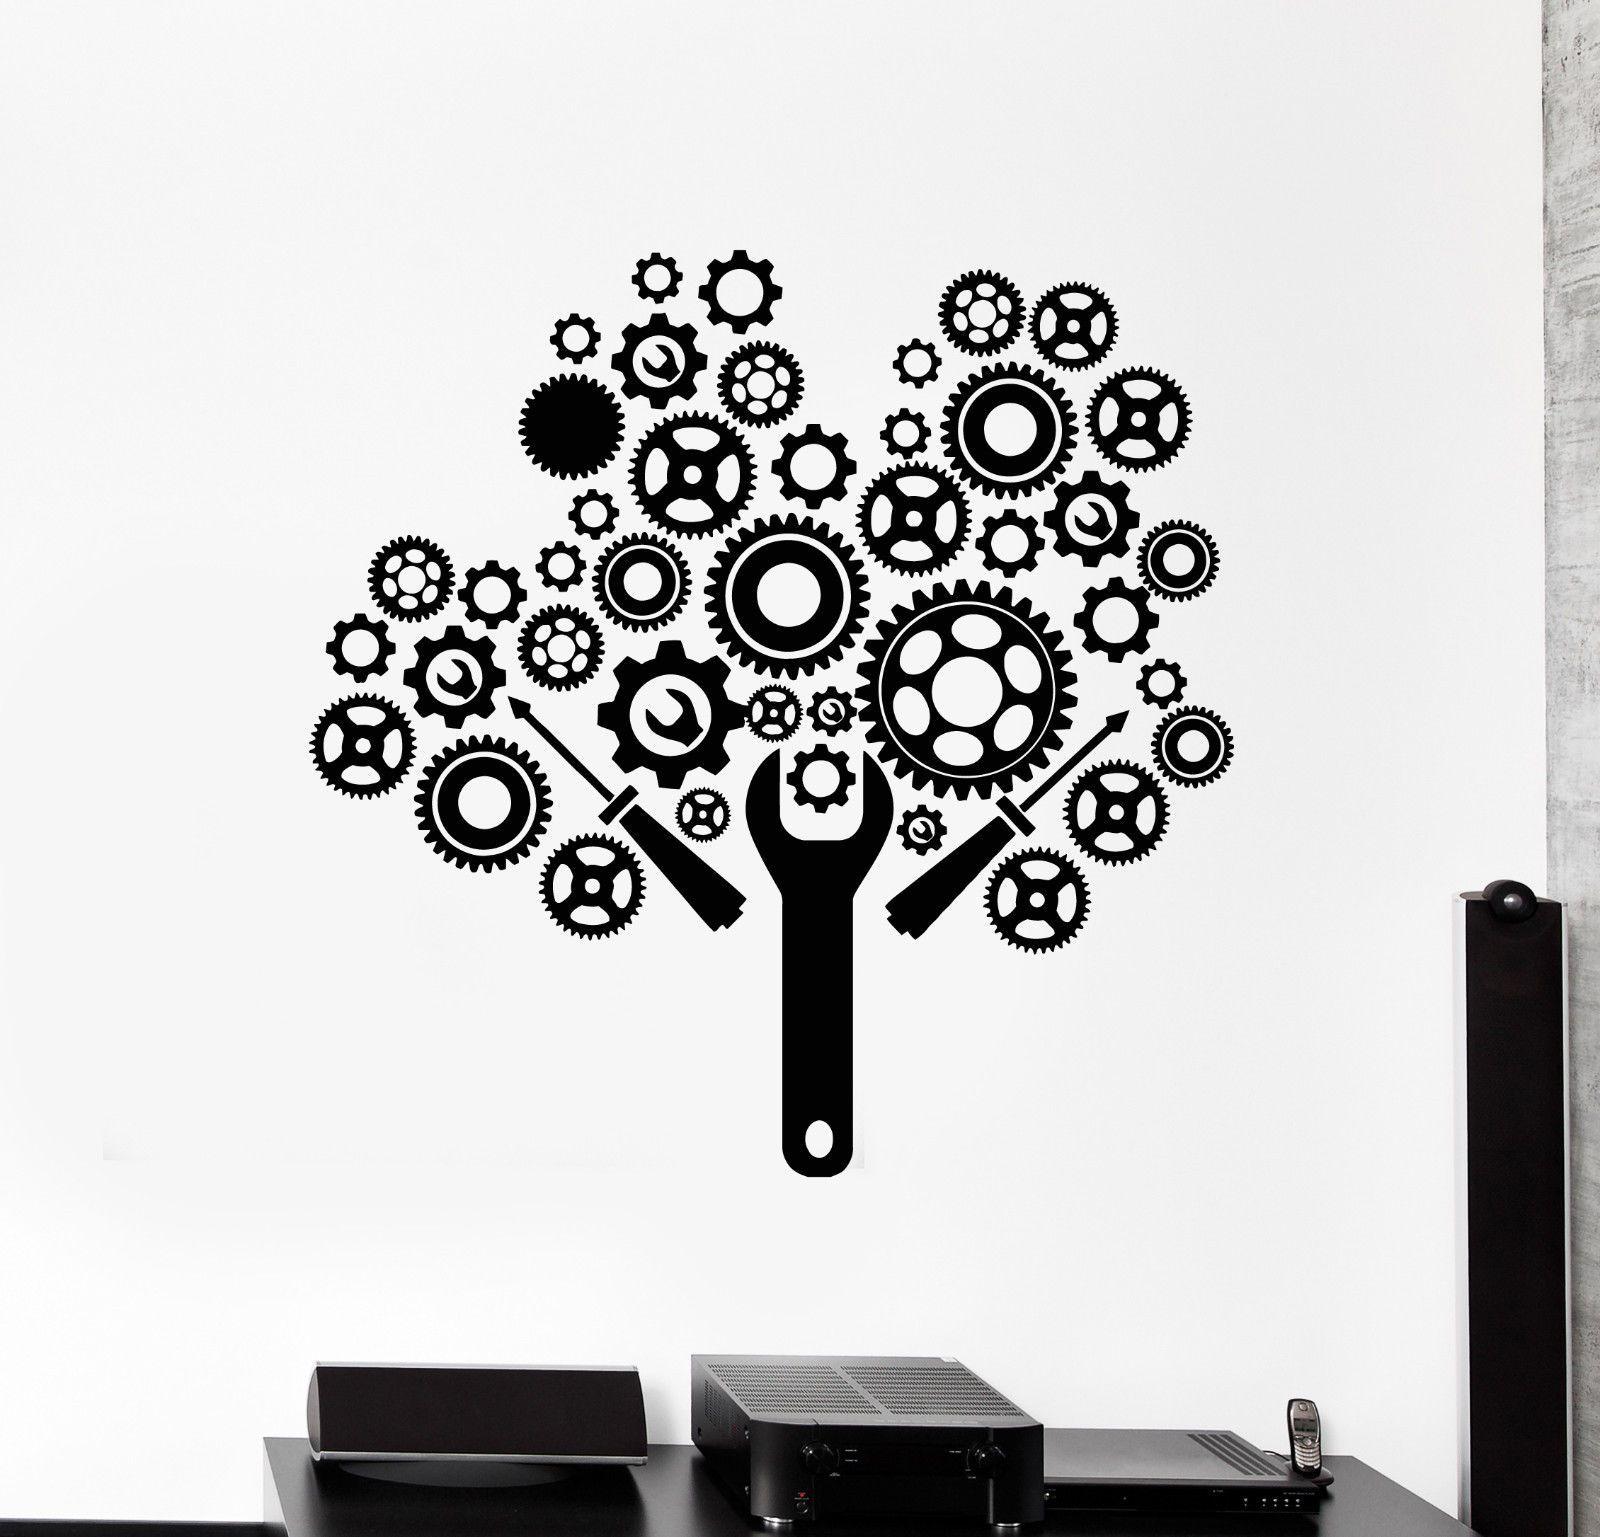 Vinyl Wall Decal Gears Mechanic Auto Car Service Garage Repair Stickers 1681ig Ebay In 2021 Vinyl Wall Decals Vinyl Wall Wall Decals [ 1537 x 1600 Pixel ]